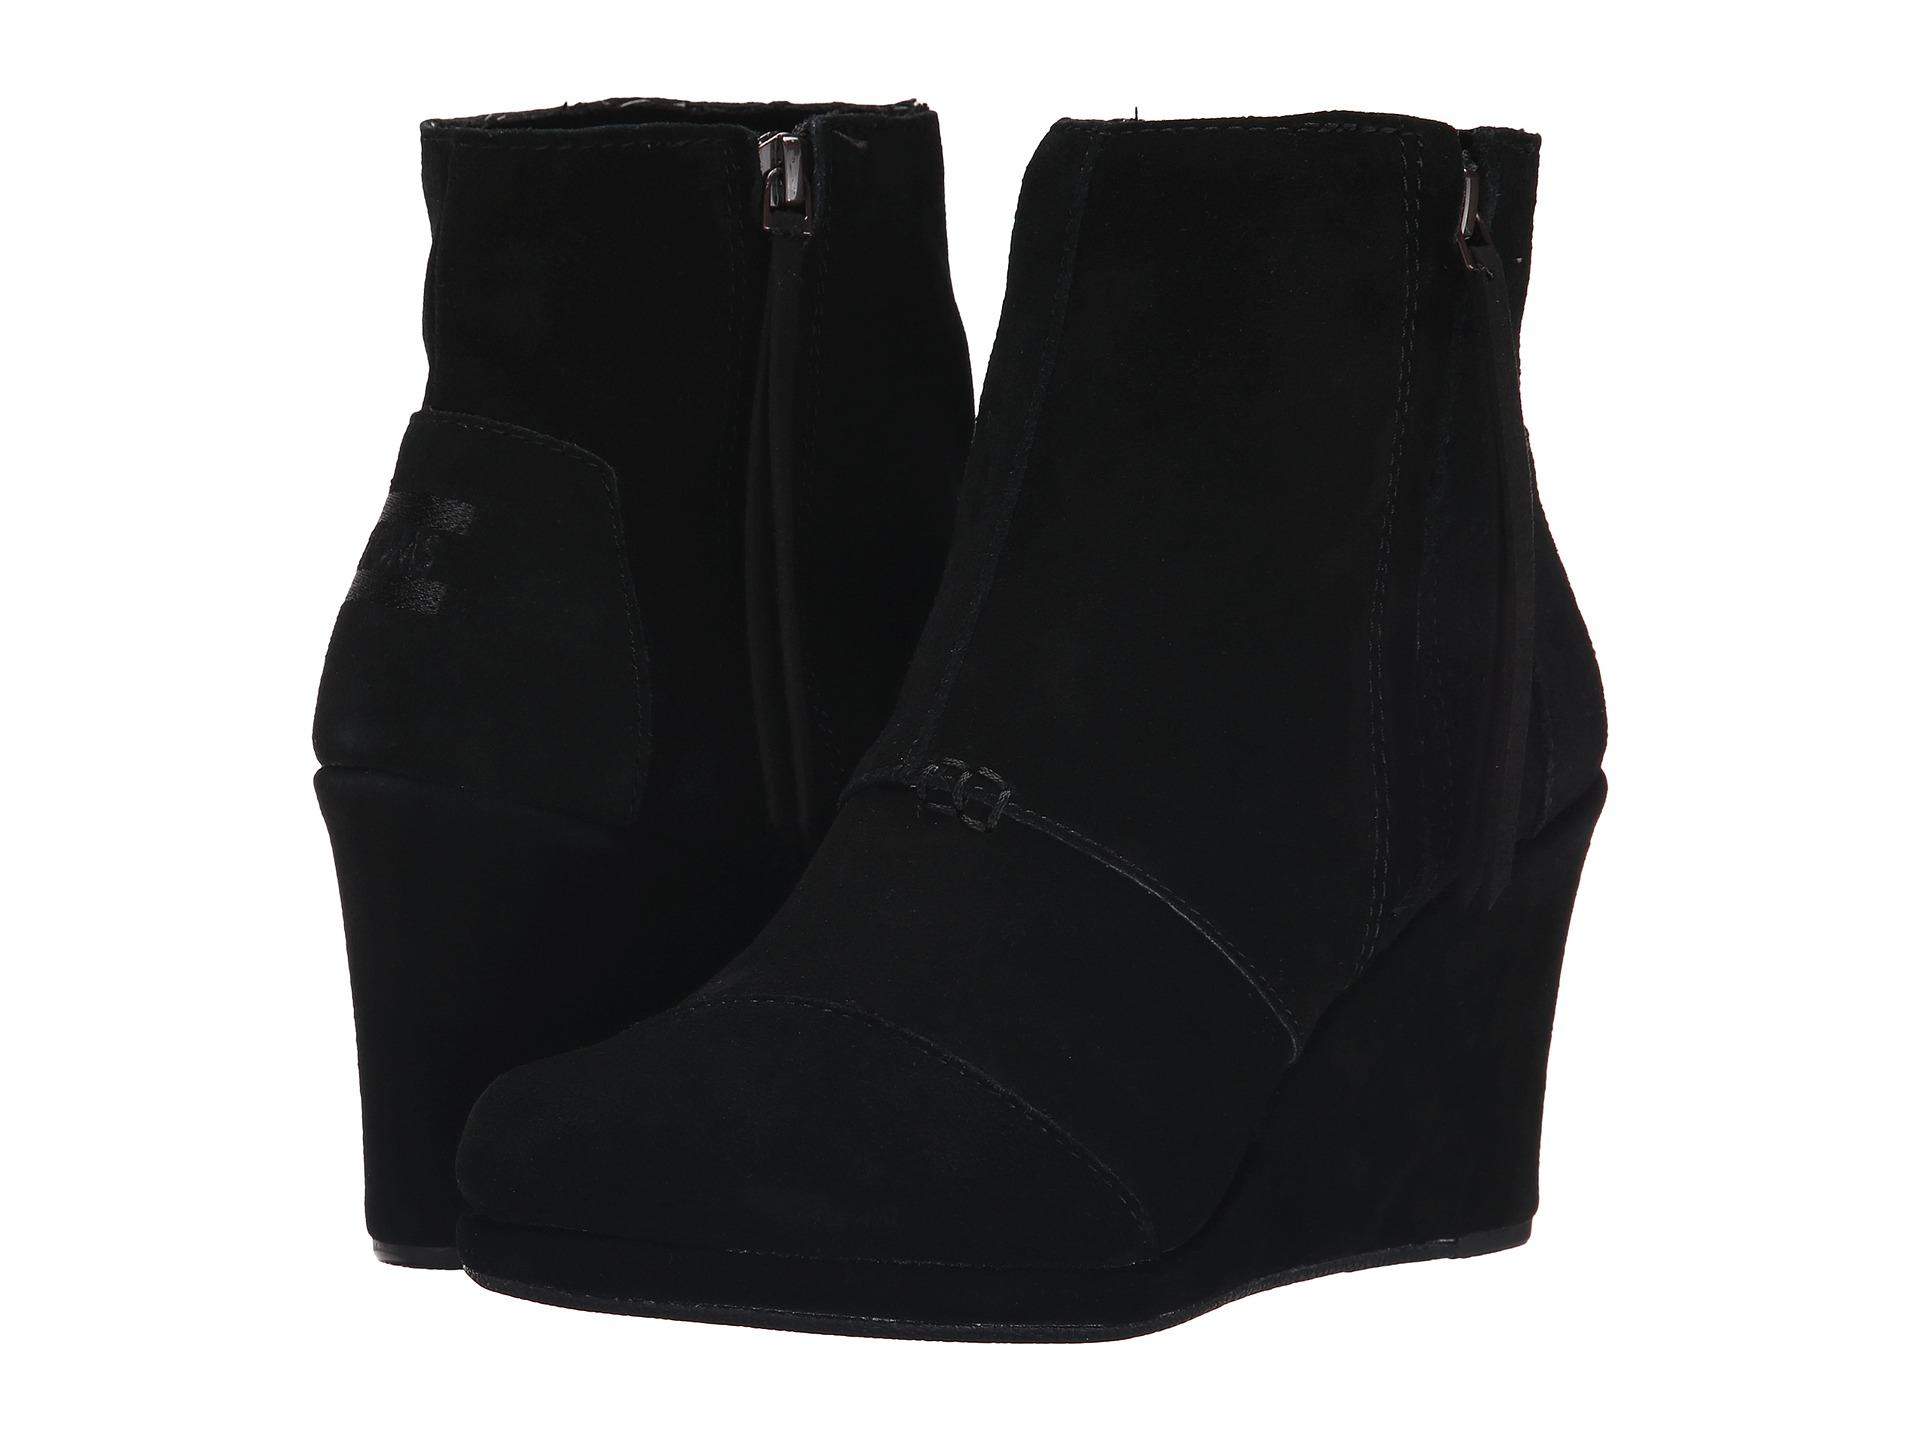 Toms Black Desert Wedge High Shoes